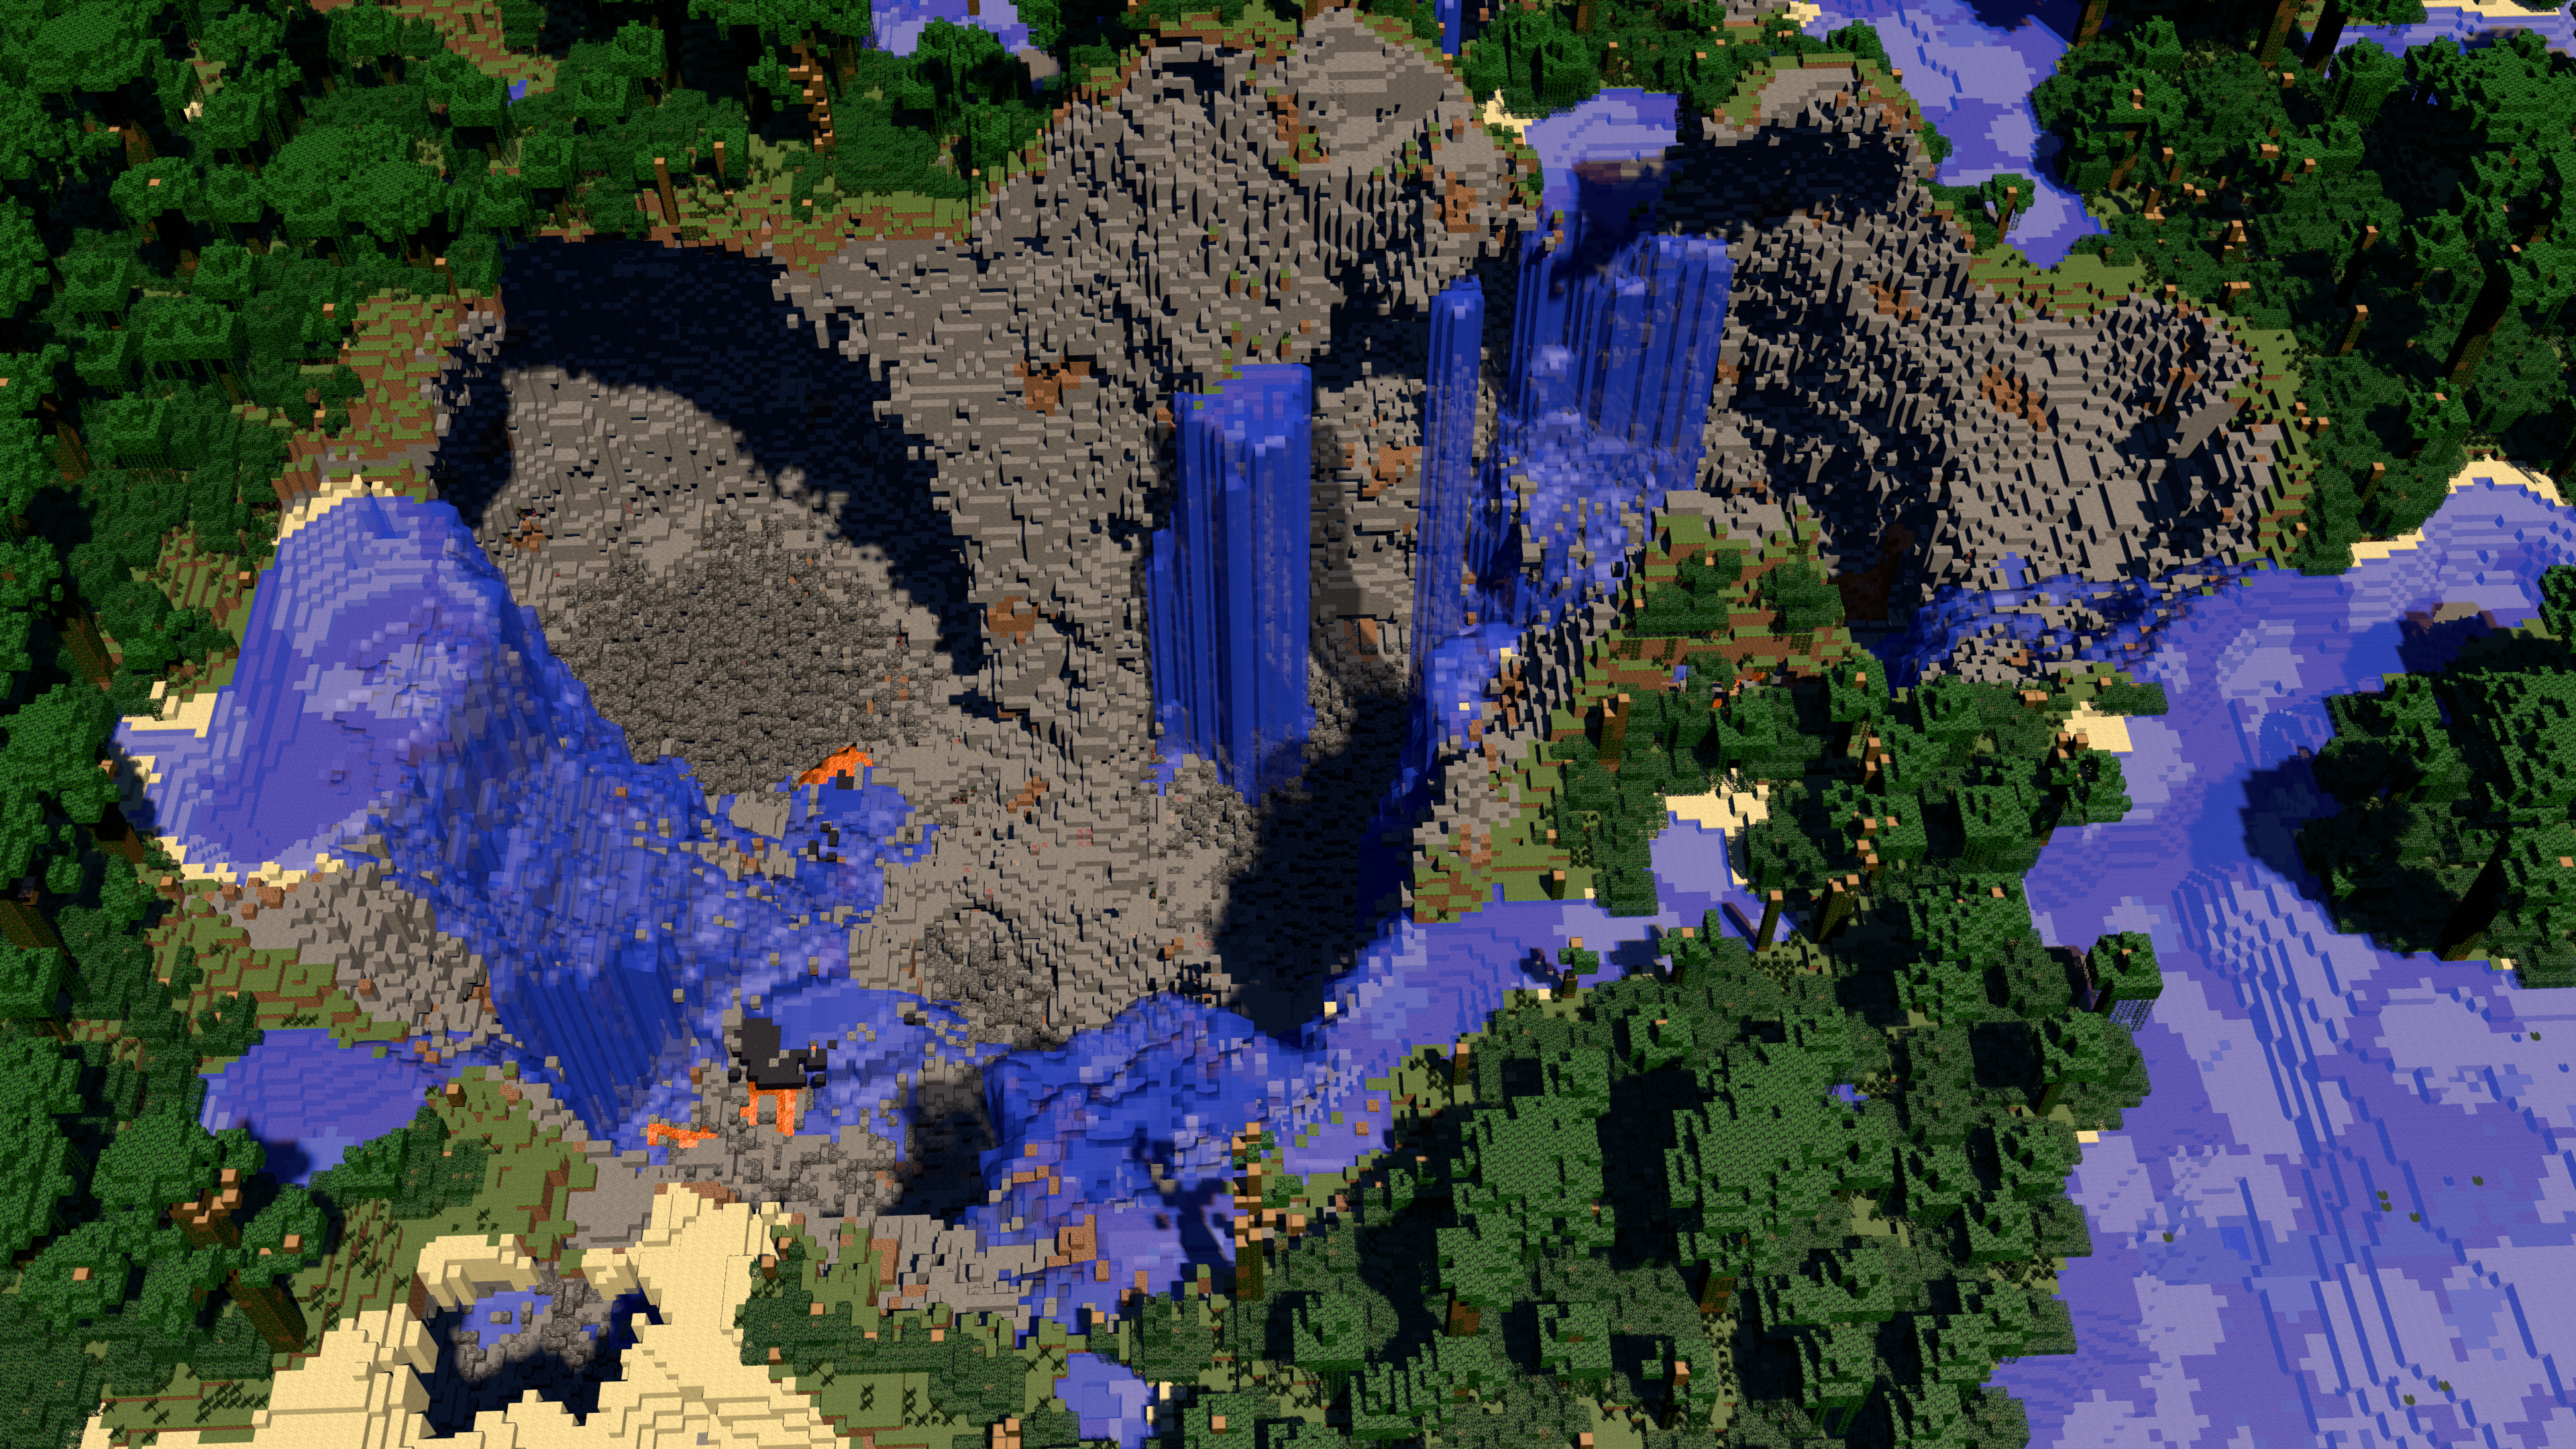 Rendered 4k Minecraft Crater Landscape Wallpaper By